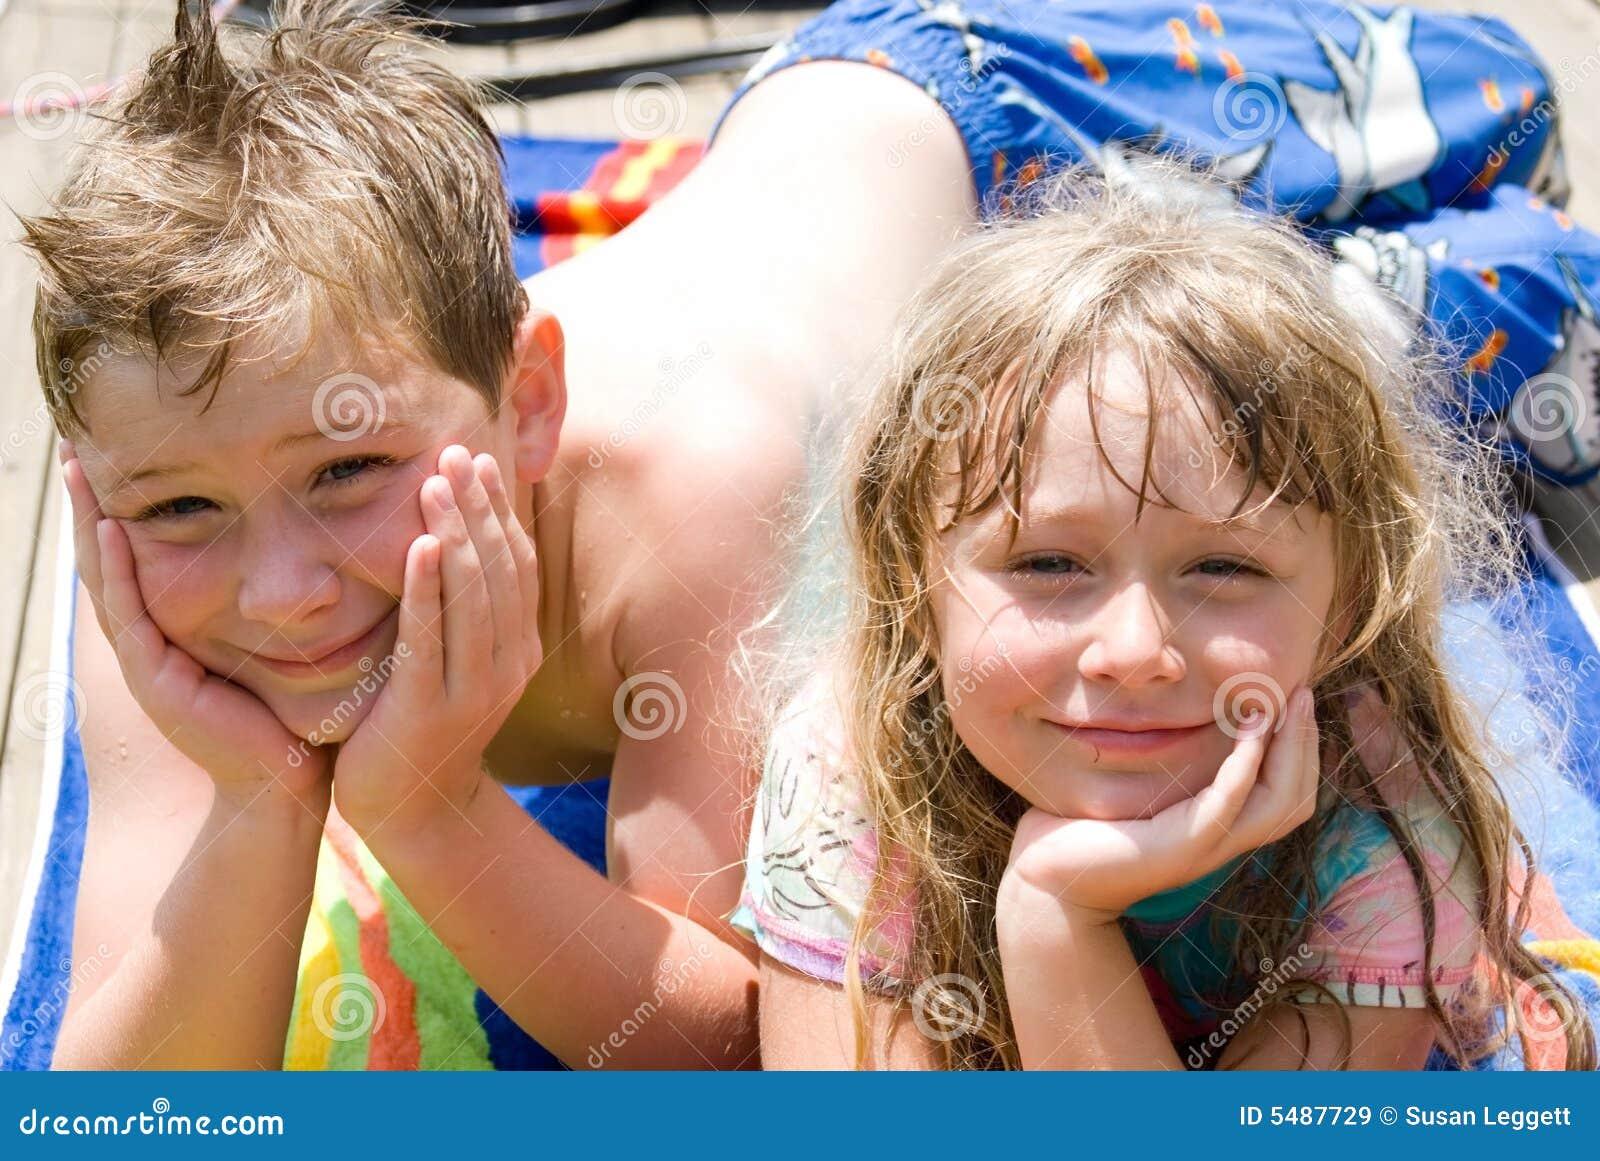 swim brother sister sex